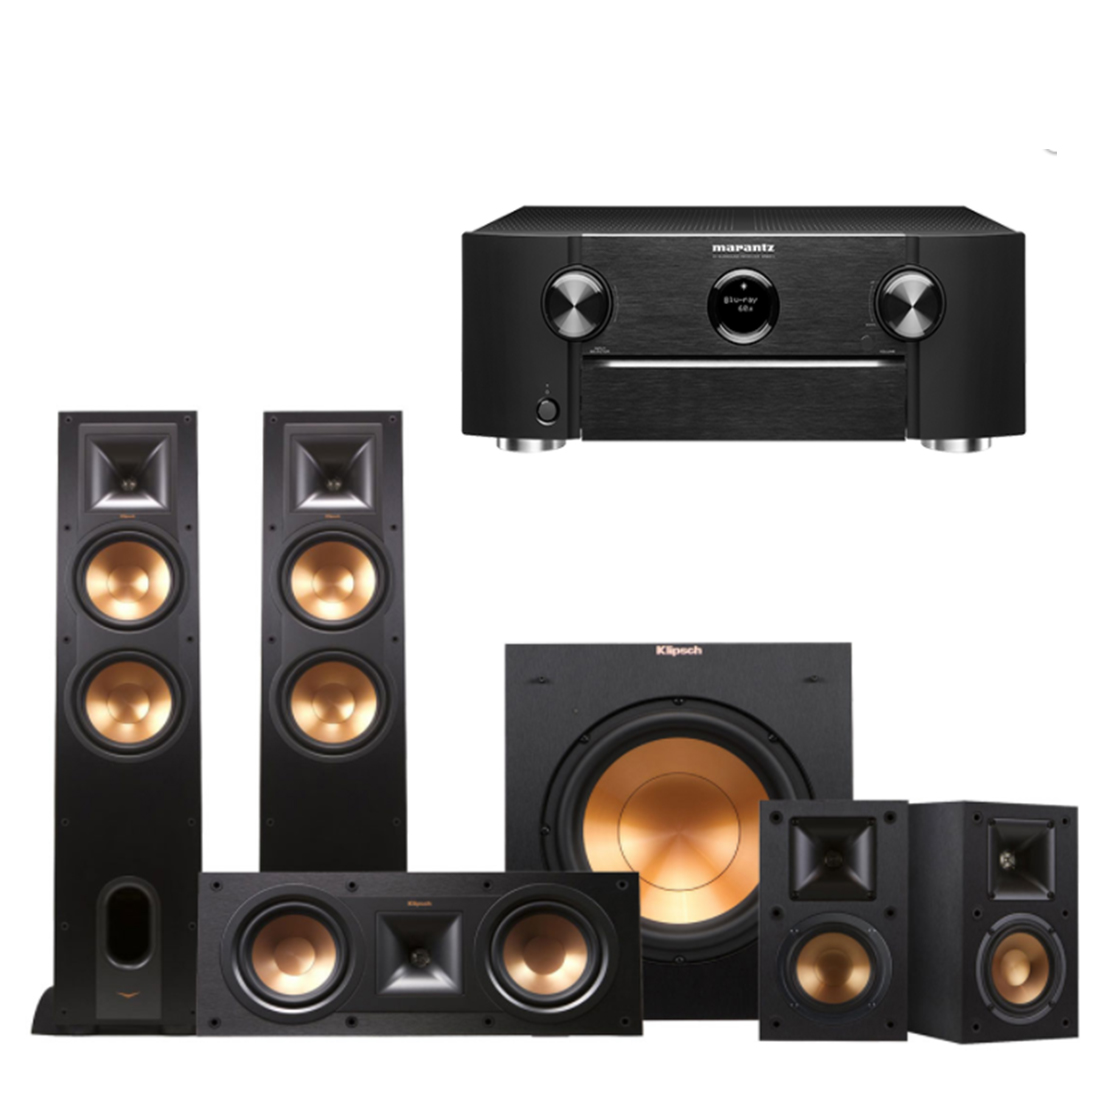 wharfedale most bookshelf l speakers sandex white efficient large diamond pair product